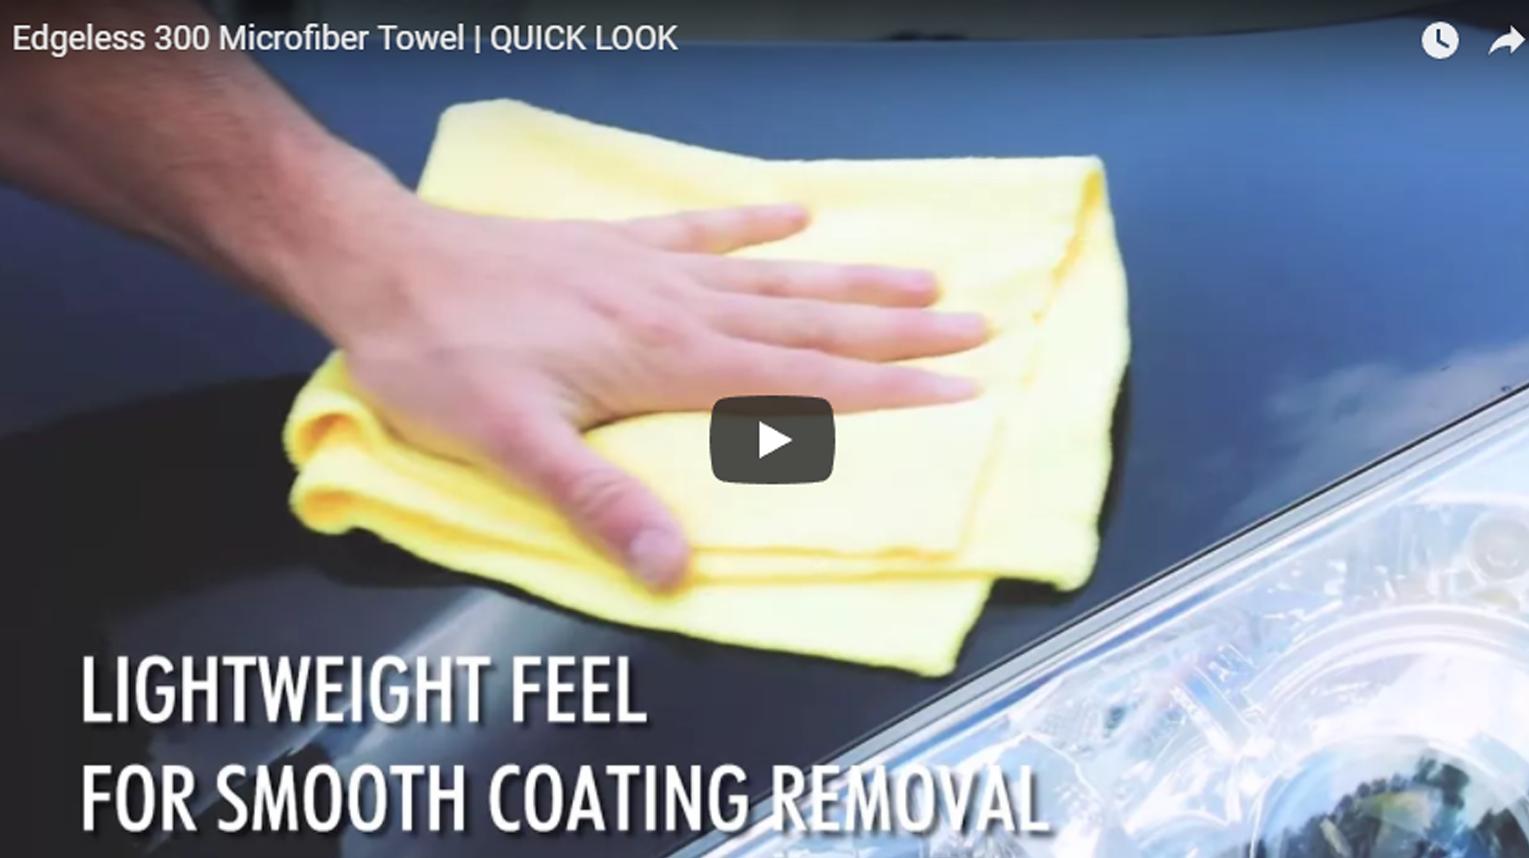 Edgeless 300 Microfiber Towel | QUICK LOOK